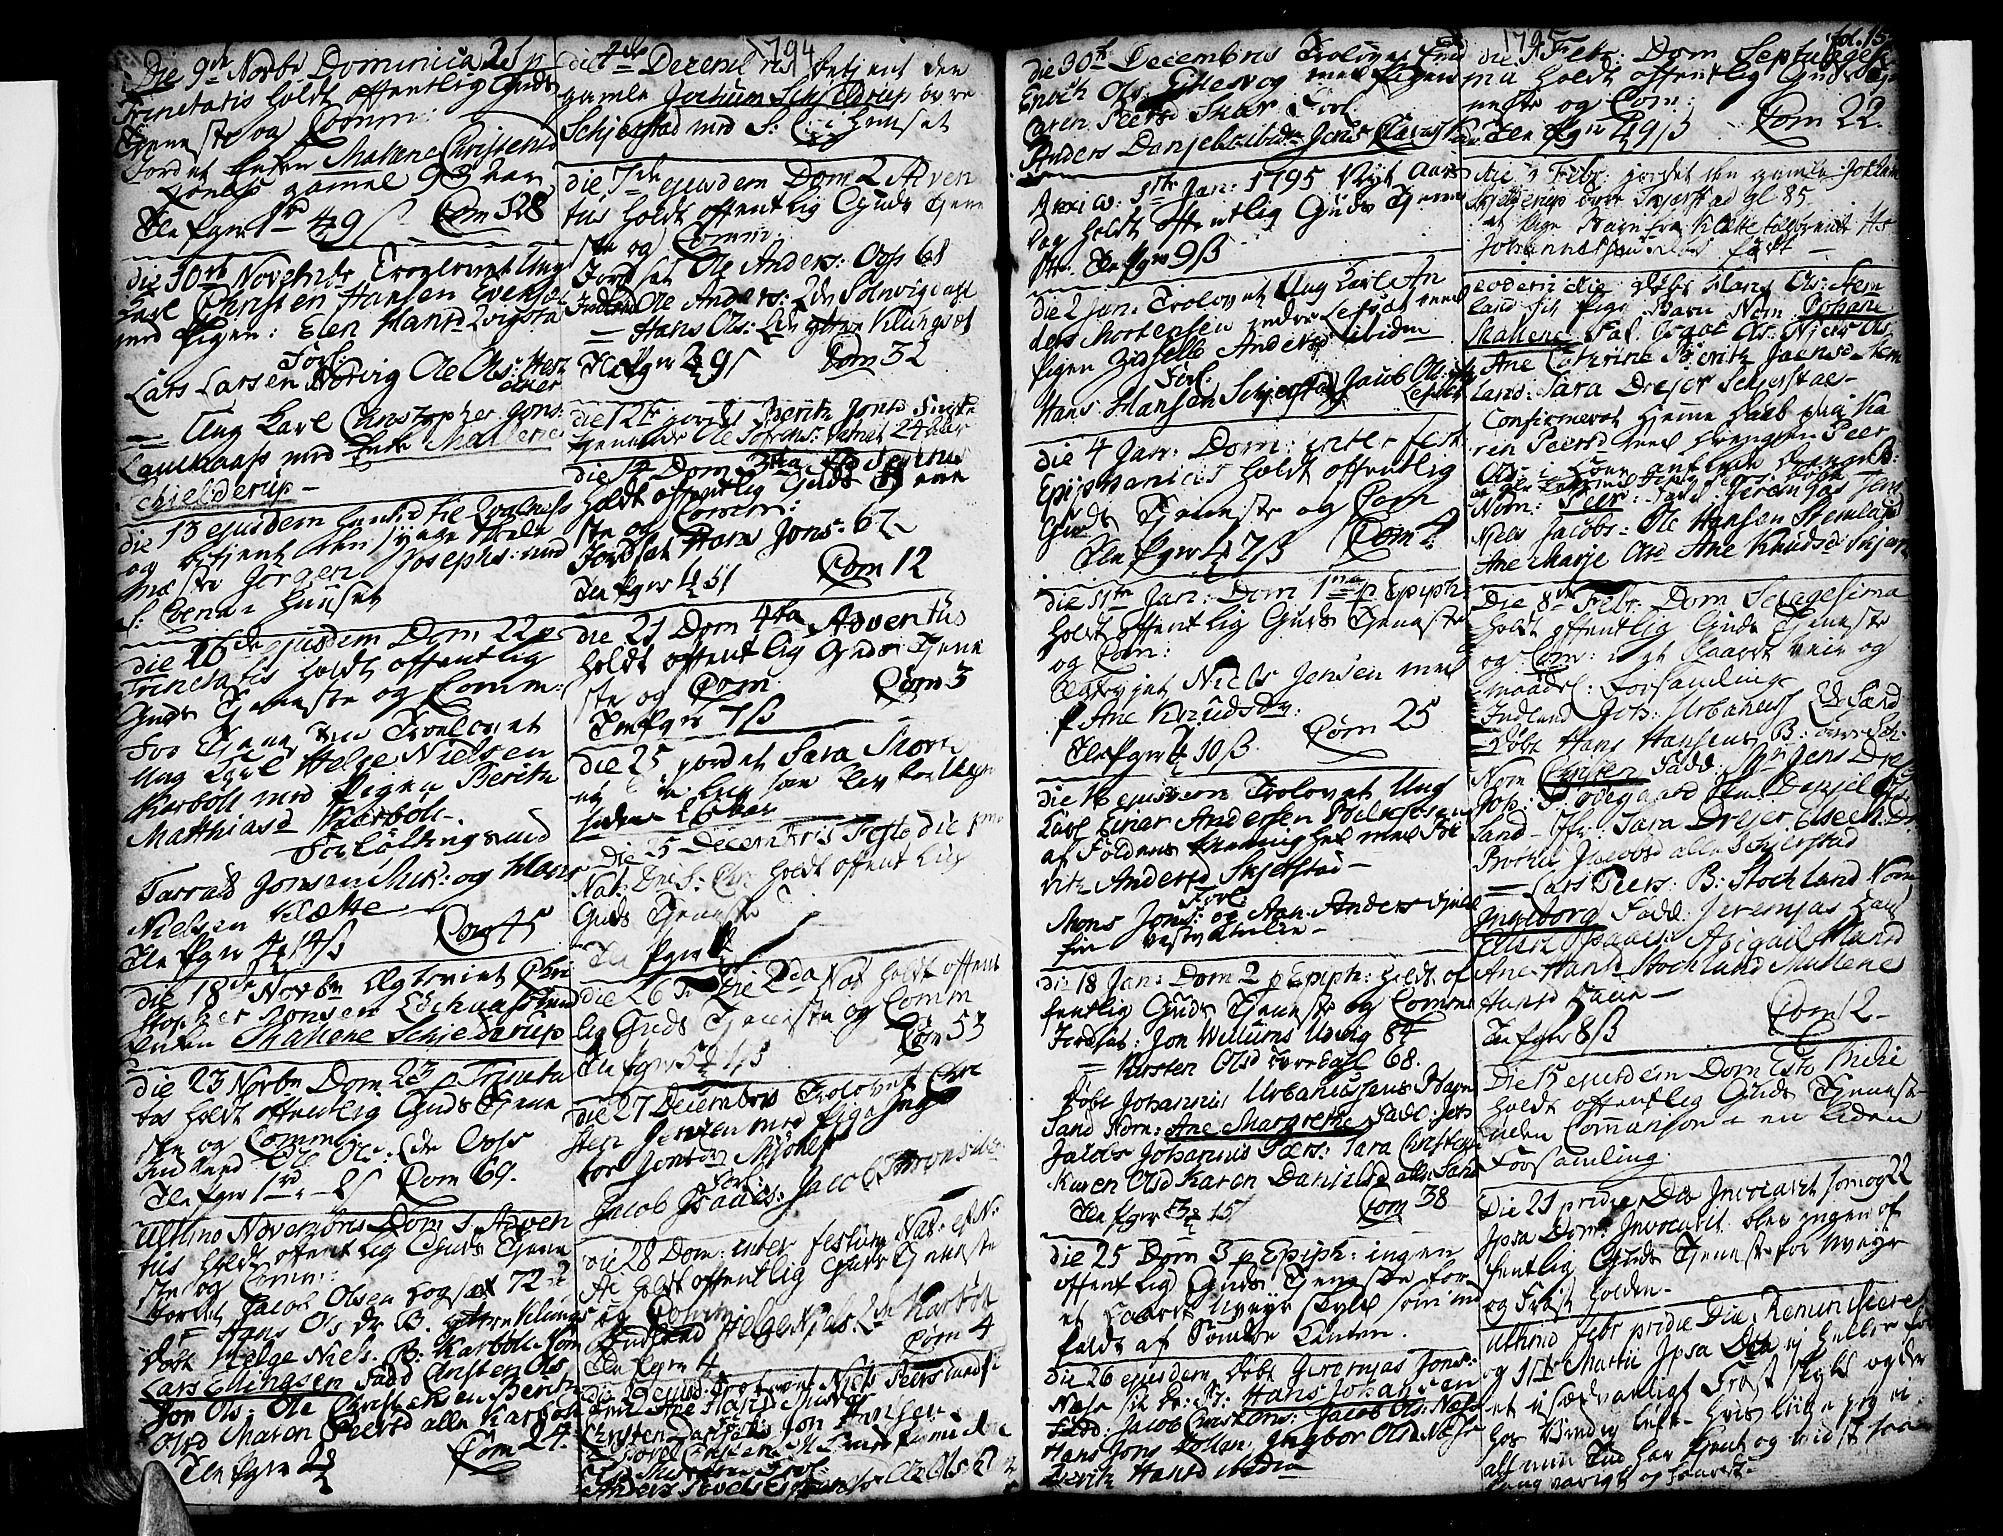 SAT, Ministerialprotokoller, klokkerbøker og fødselsregistre - Nordland, 852/L0735: Ministerialbok nr. 852A05, 1762-1820, s. 157